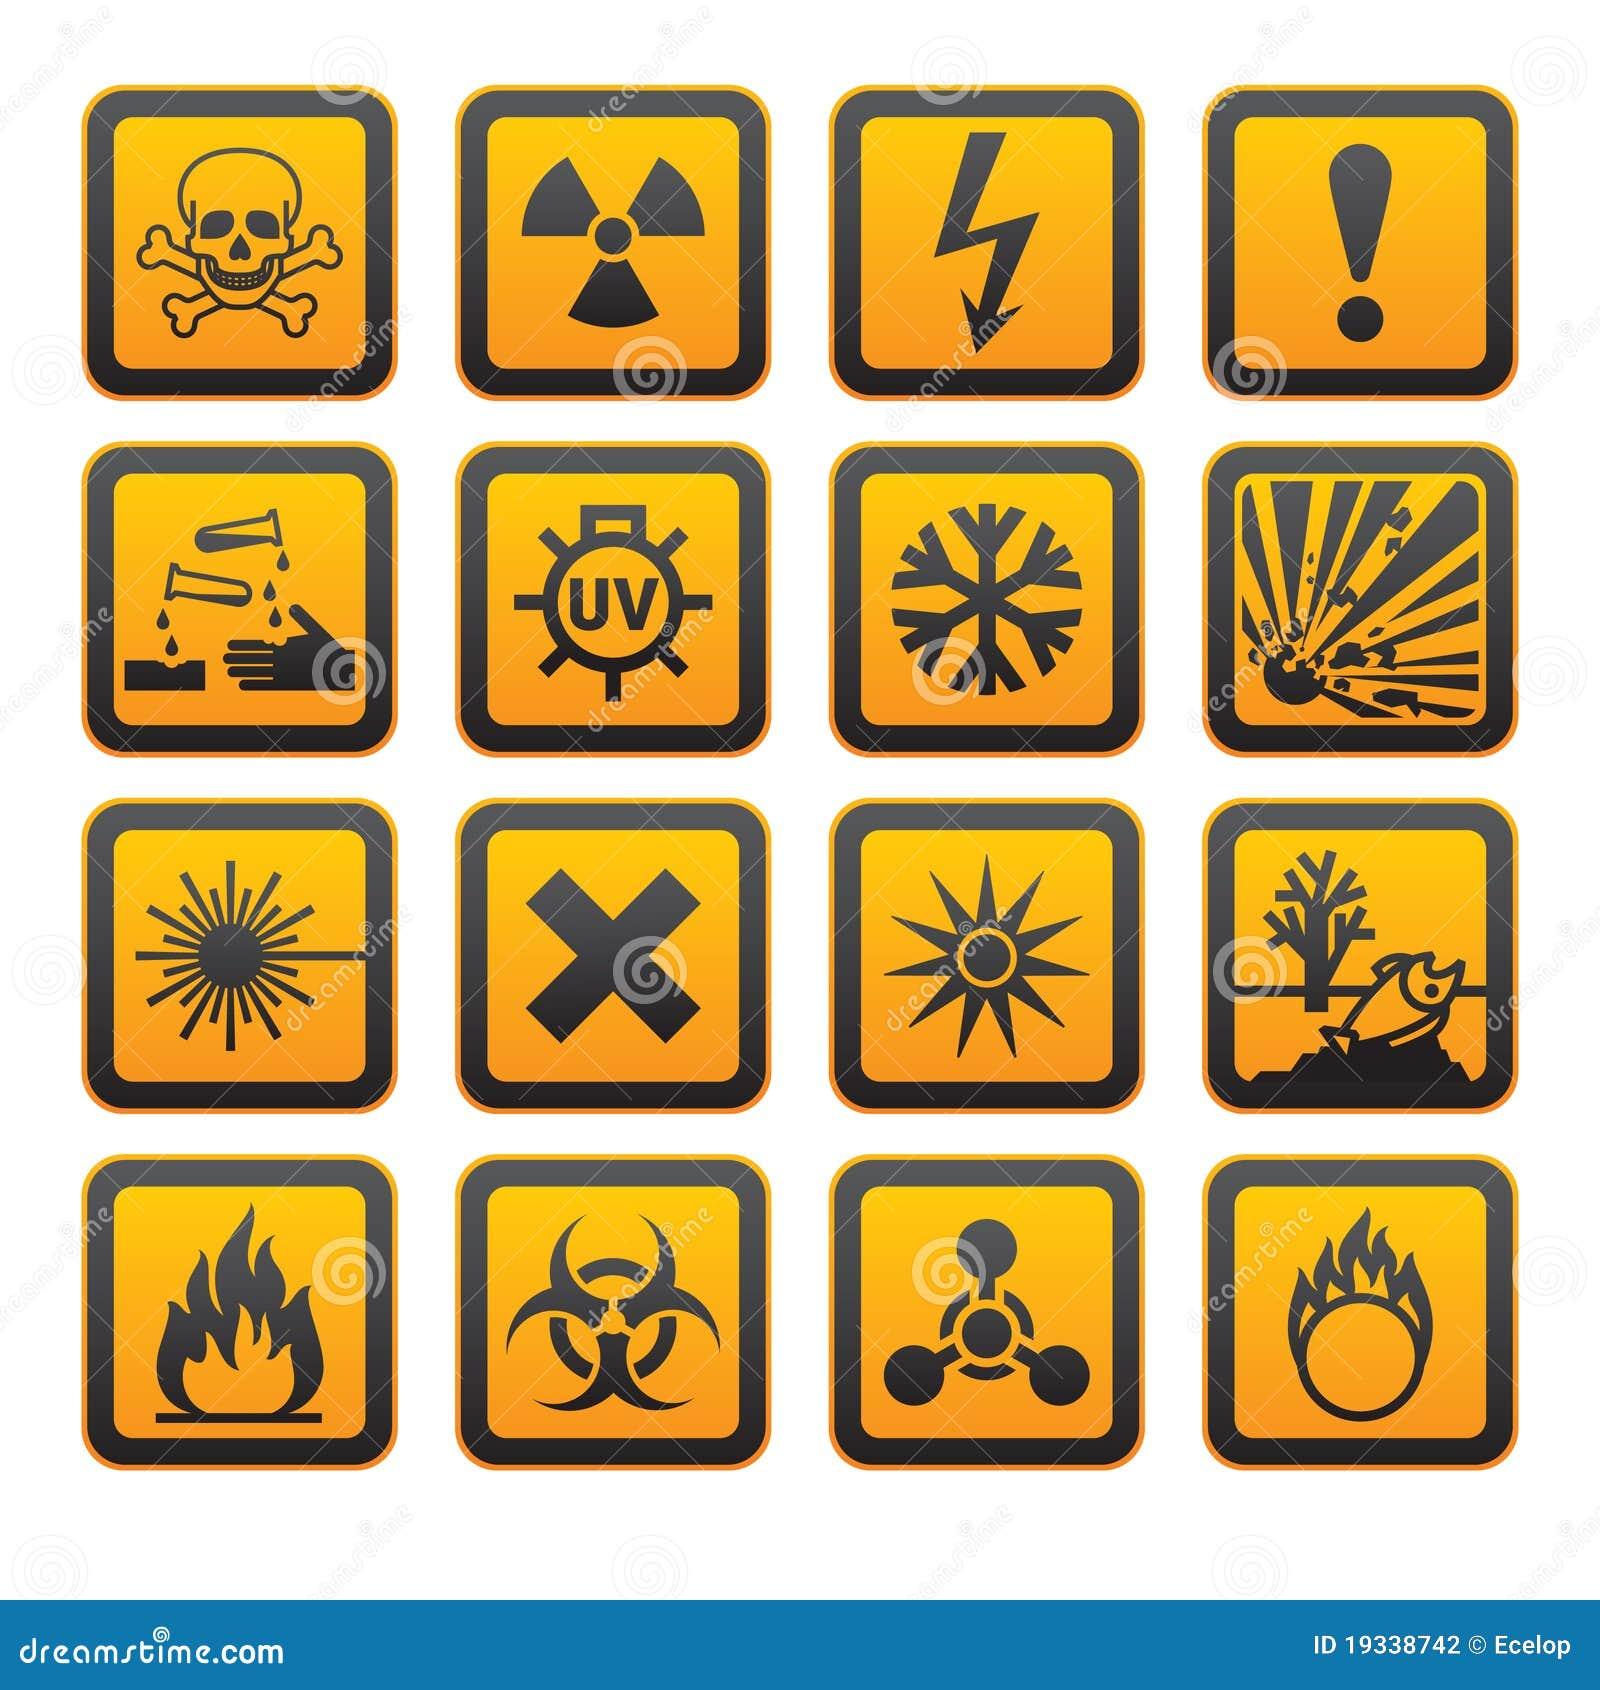 Hazard symbols stock vector illustration of background 13405505 hazard symbols orange s sign stock photography buycottarizona